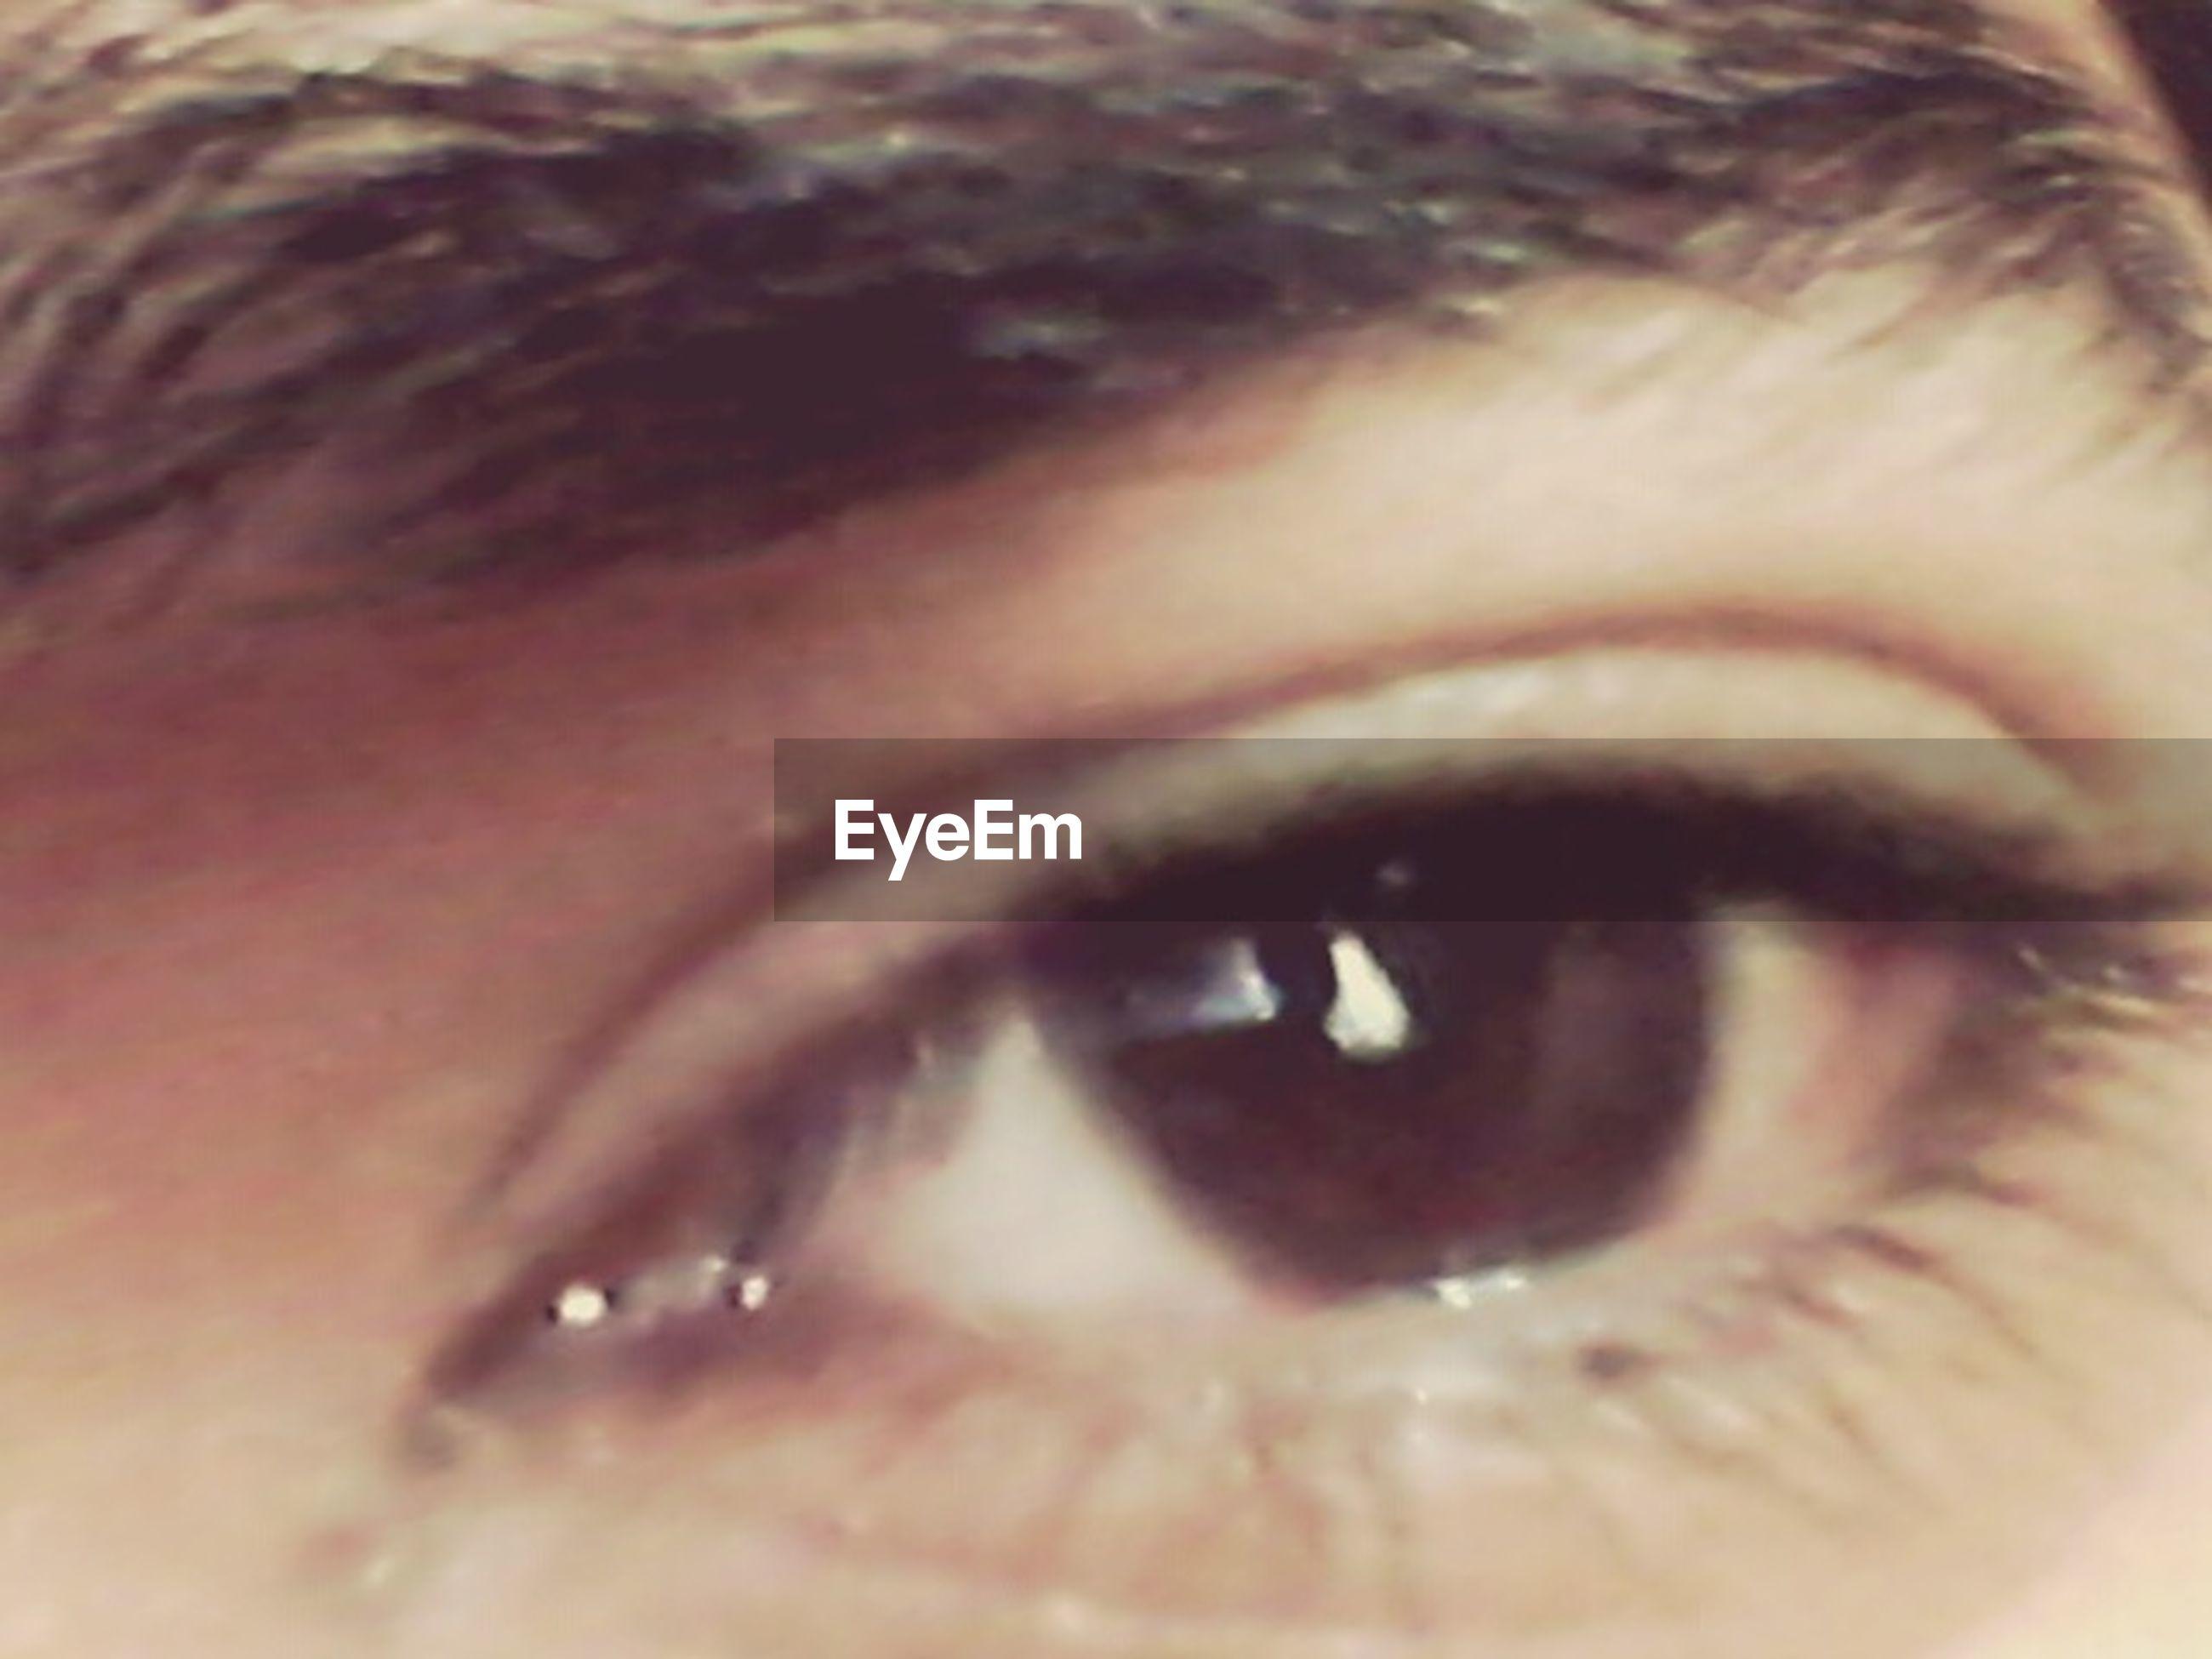 human eye, close-up, eyelash, eyesight, human face, headshot, sensory perception, human skin, looking at camera, lifestyles, eyebrow, portrait, extreme close-up, part of, extreme close up, eyeball, iris - eye